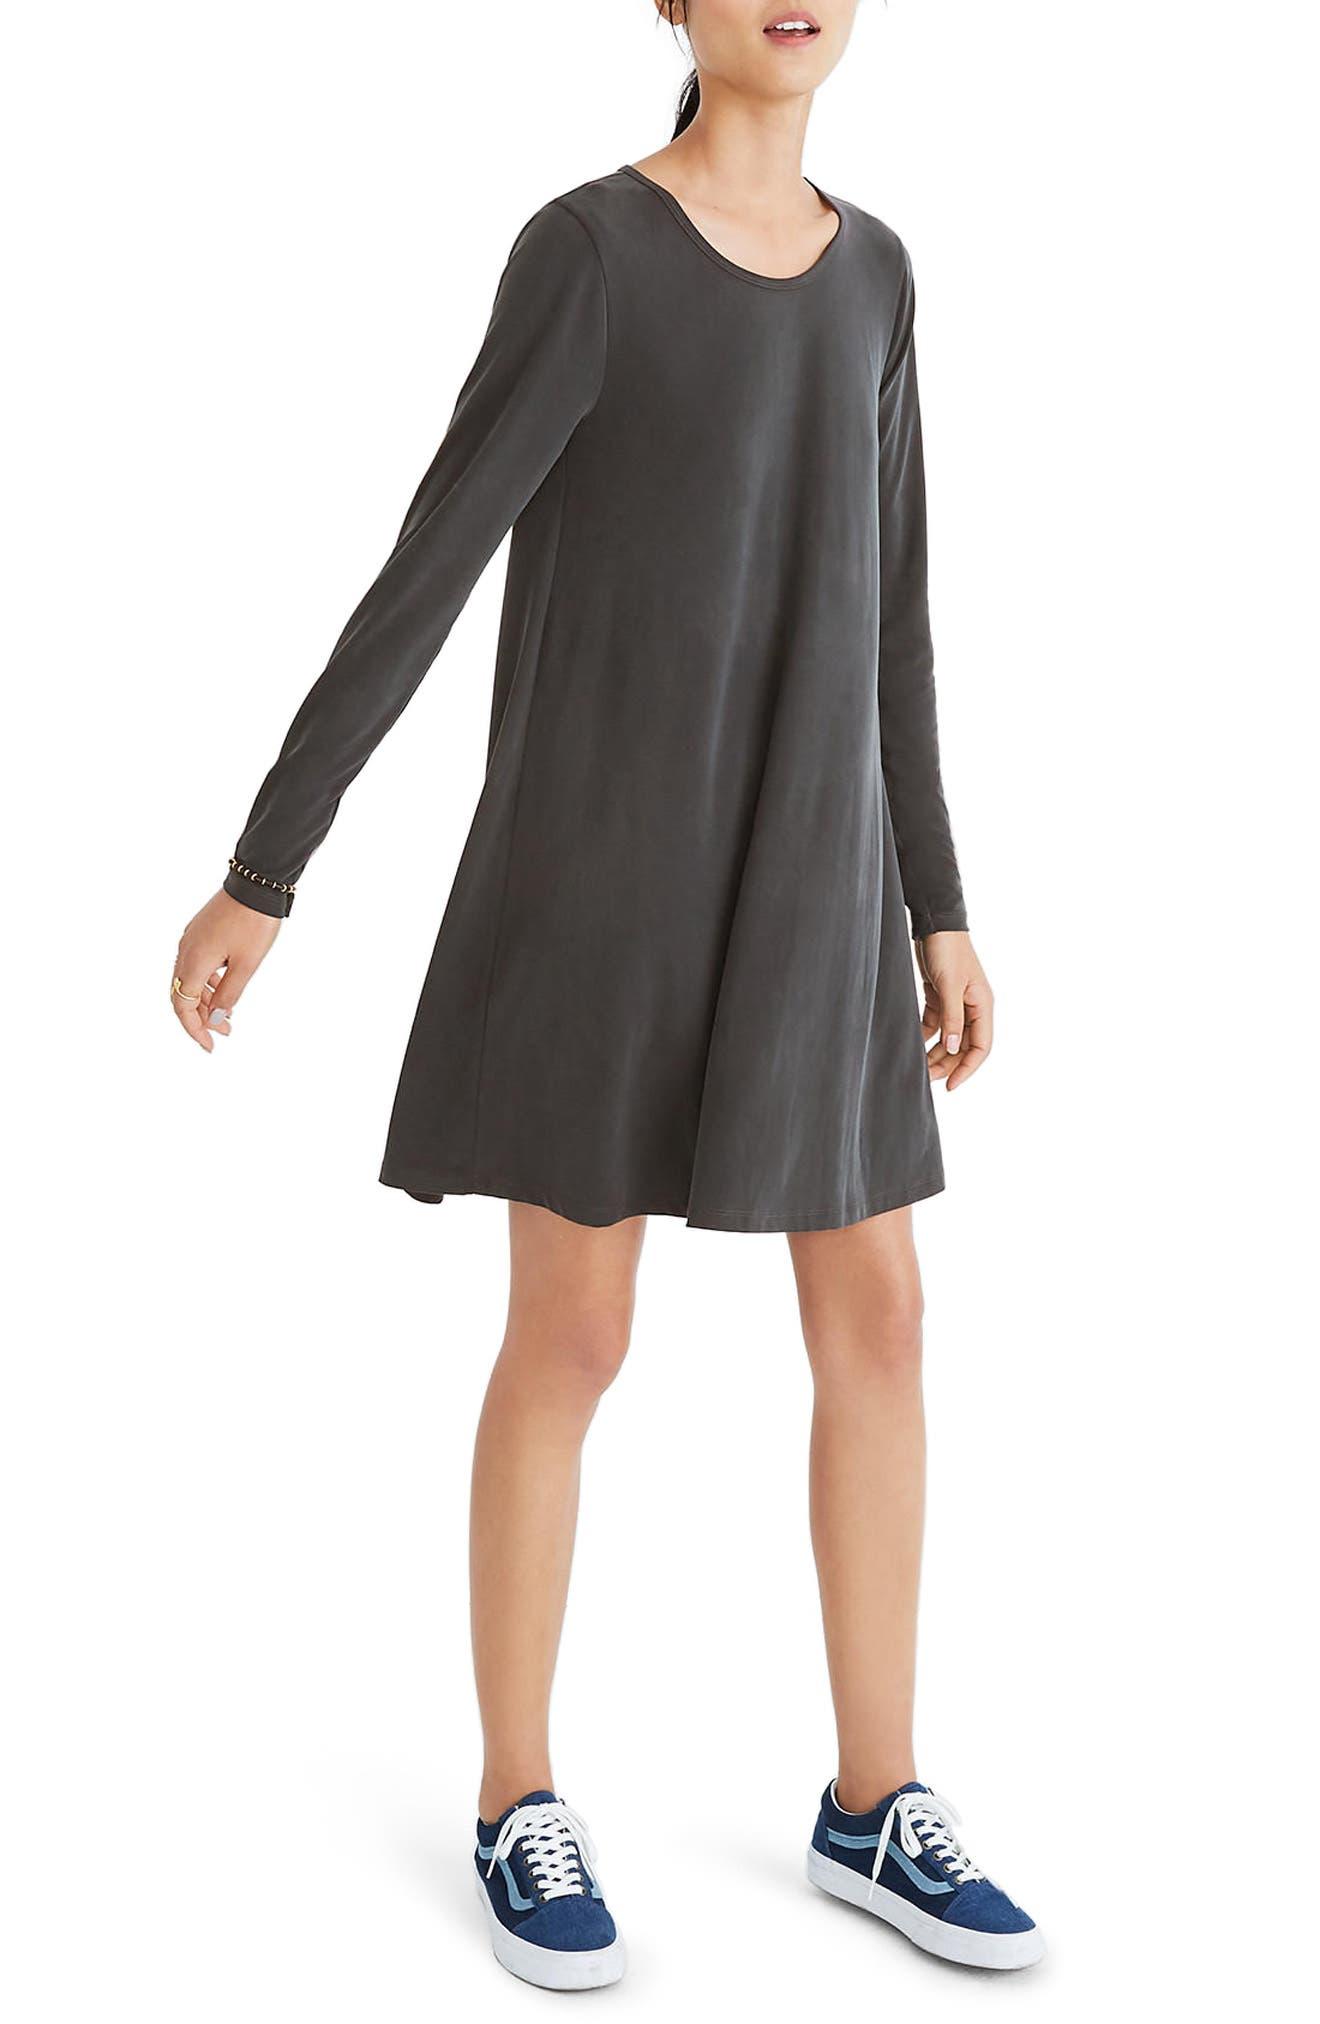 Madewell Sandwashed Swingy T-Shirt Dress